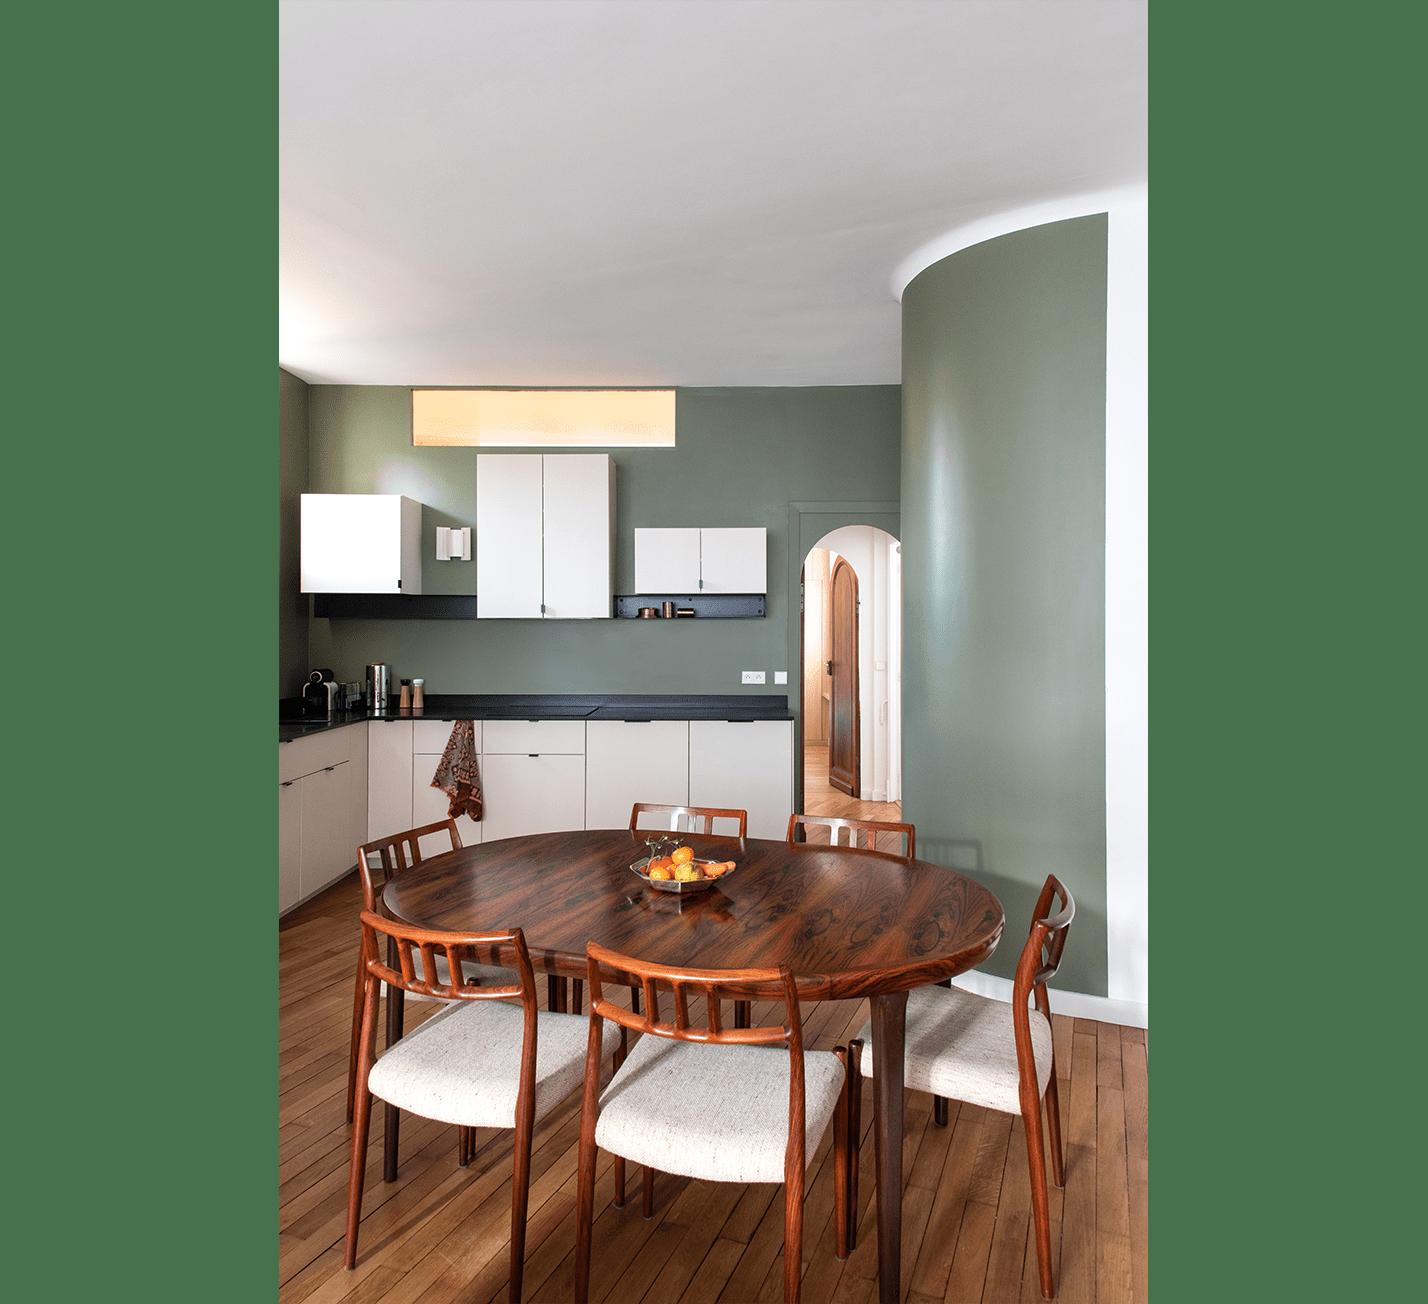 Projet-Emile-Atelier-Steve-Pauline-Borgia-Architecte-interieur-03-min